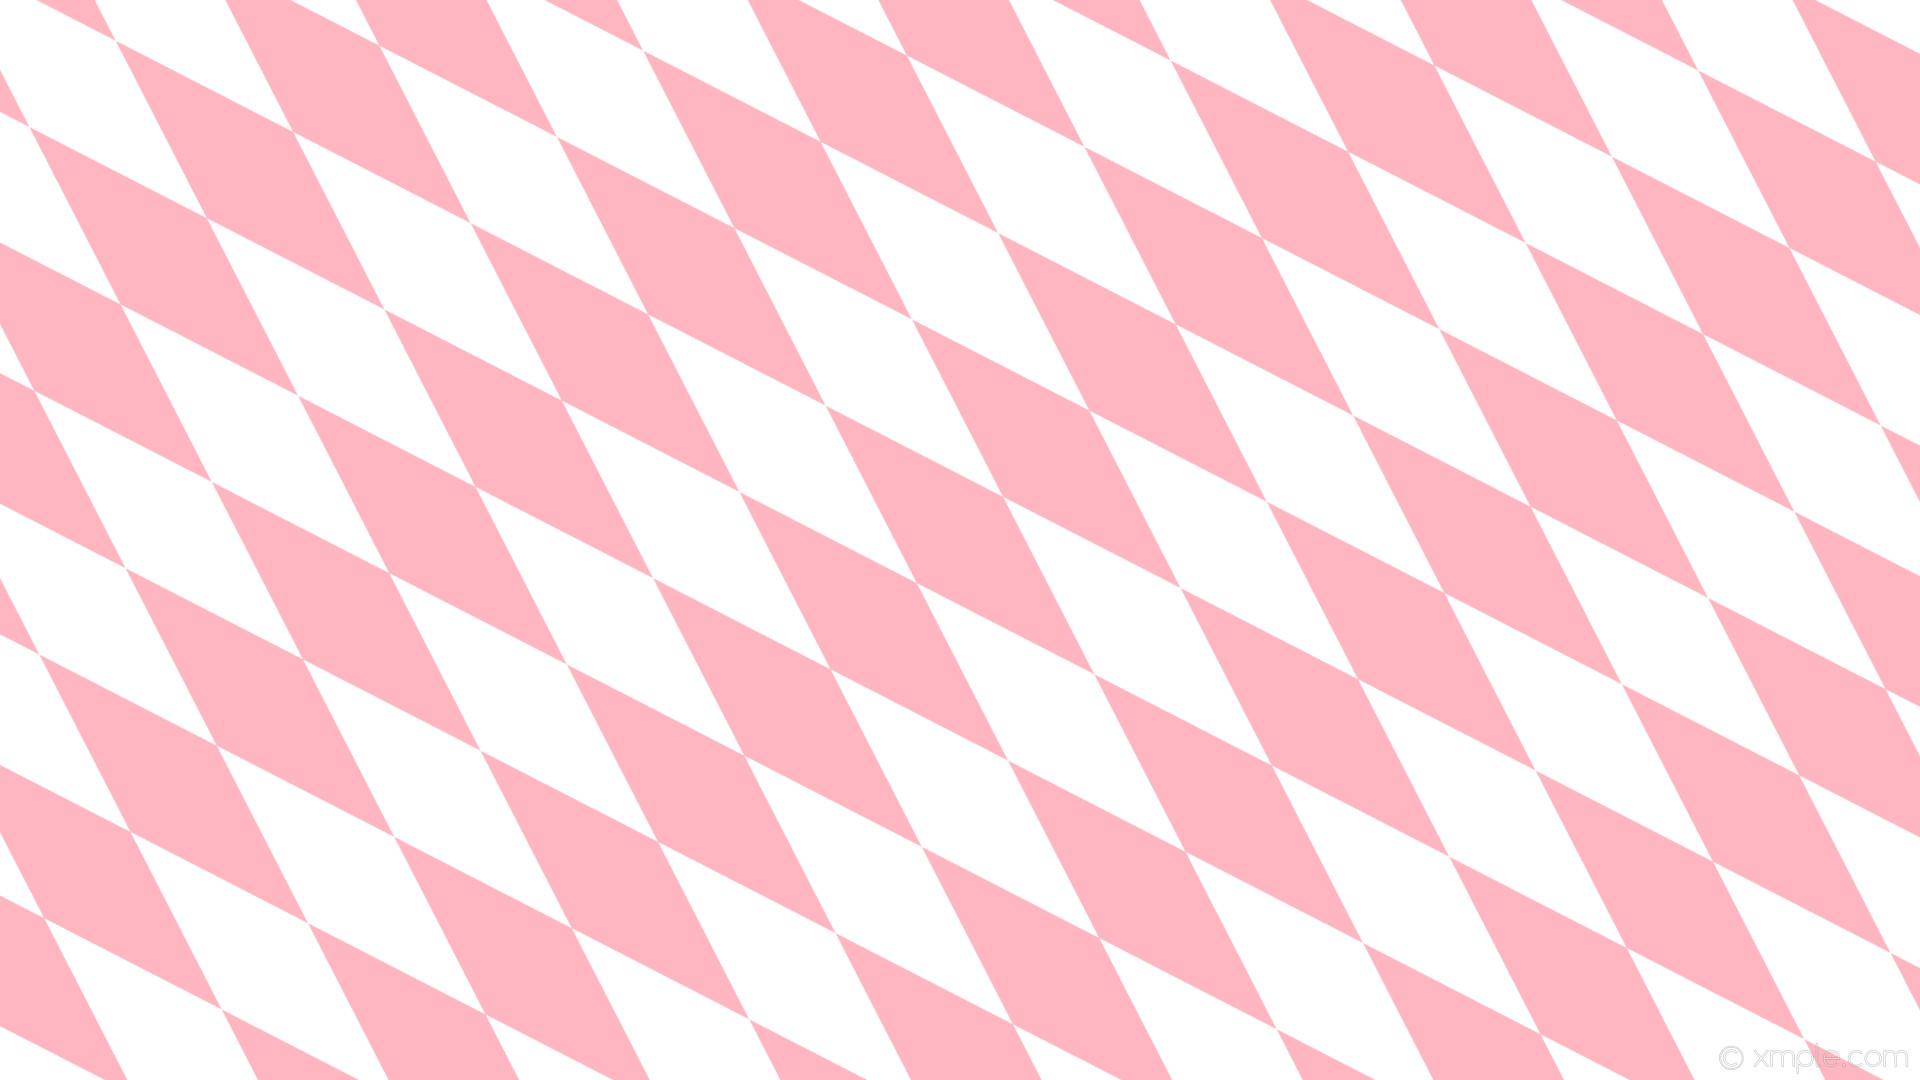 wallpaper pink diamond white lozenge rhombus light pink #ffb6c1 #ffffff  135° 380px 122px